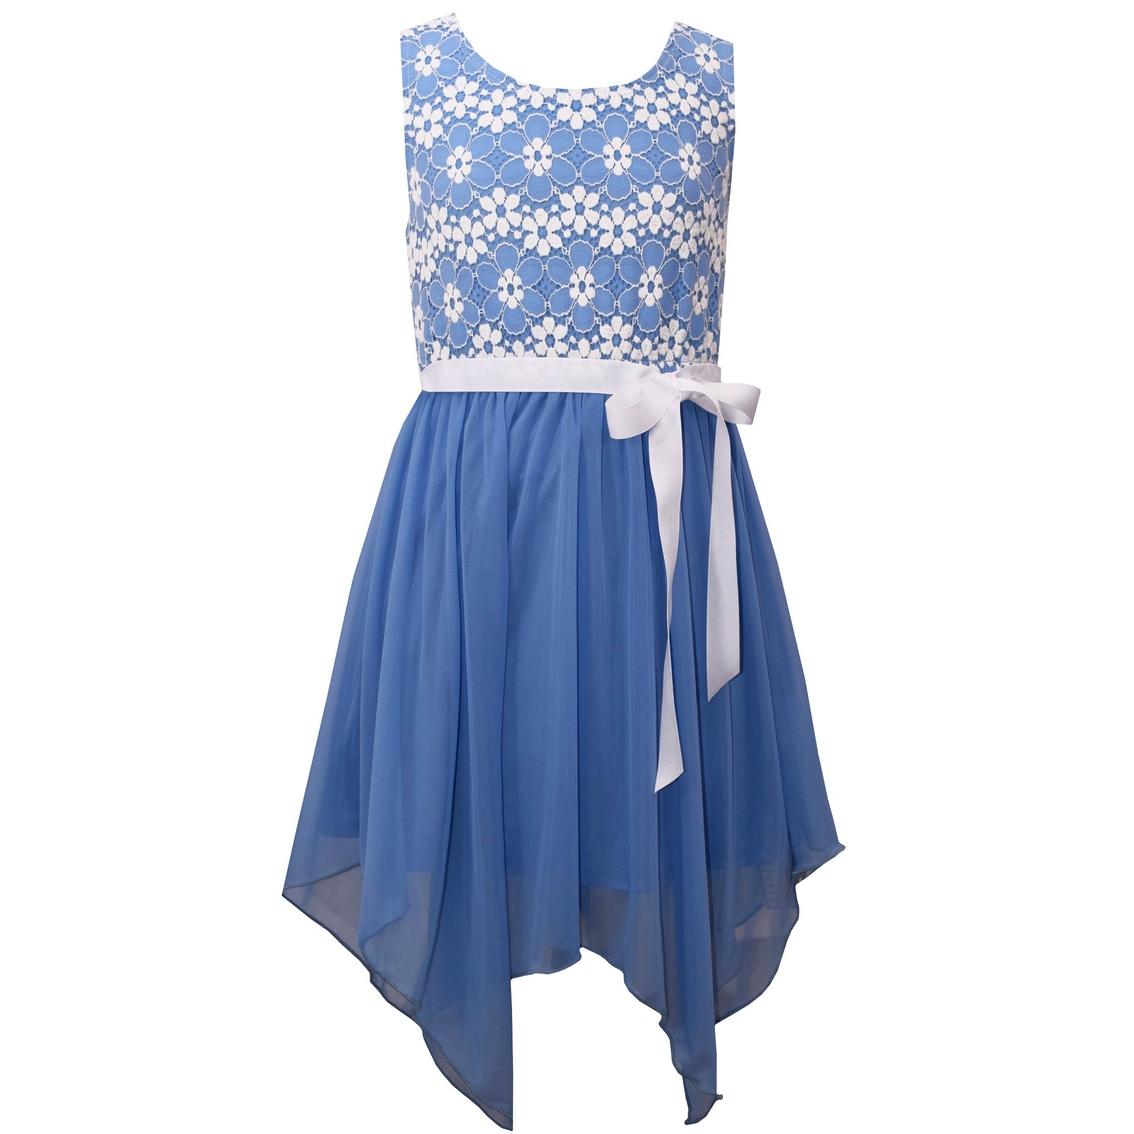 009fa3922 Bonnie Jean Little Girls Lace Bodice Sharkbite Dress | Girls 4-6x ...